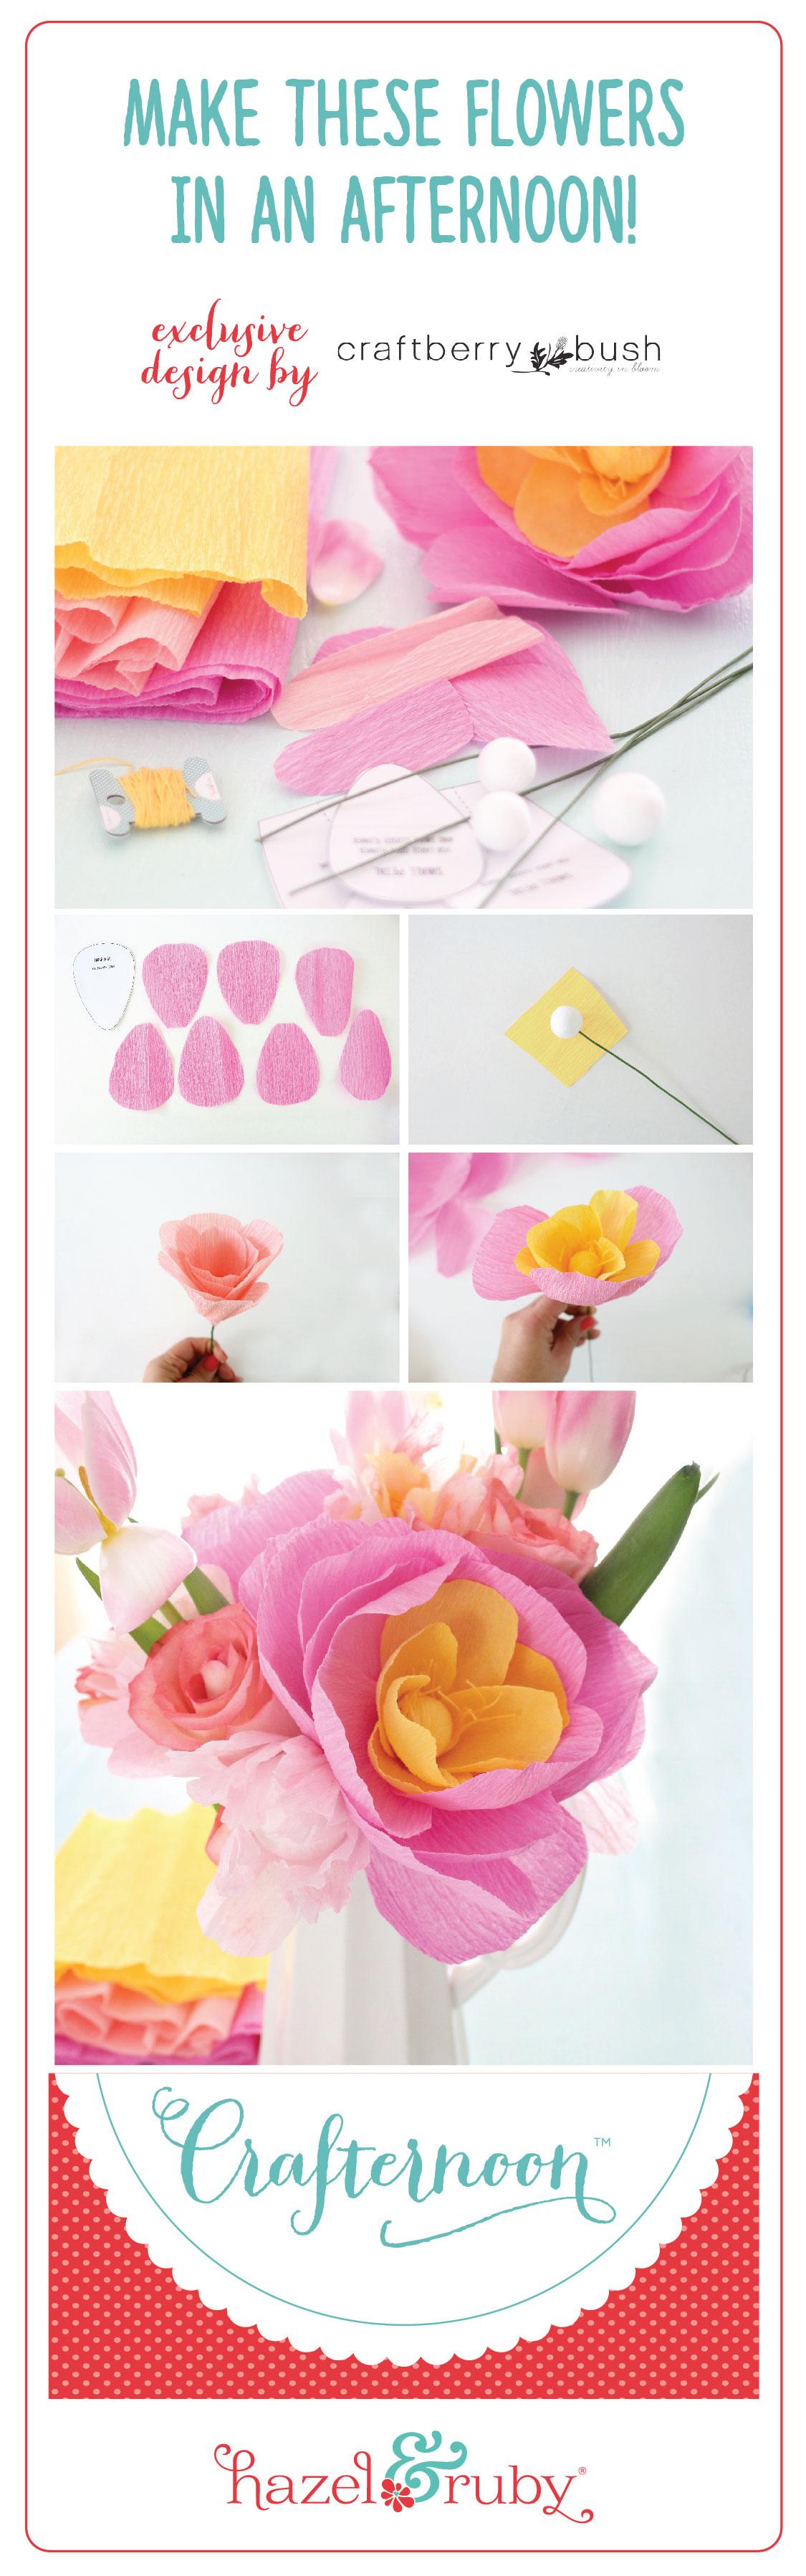 HRCN119_Crepe Paper Flowers